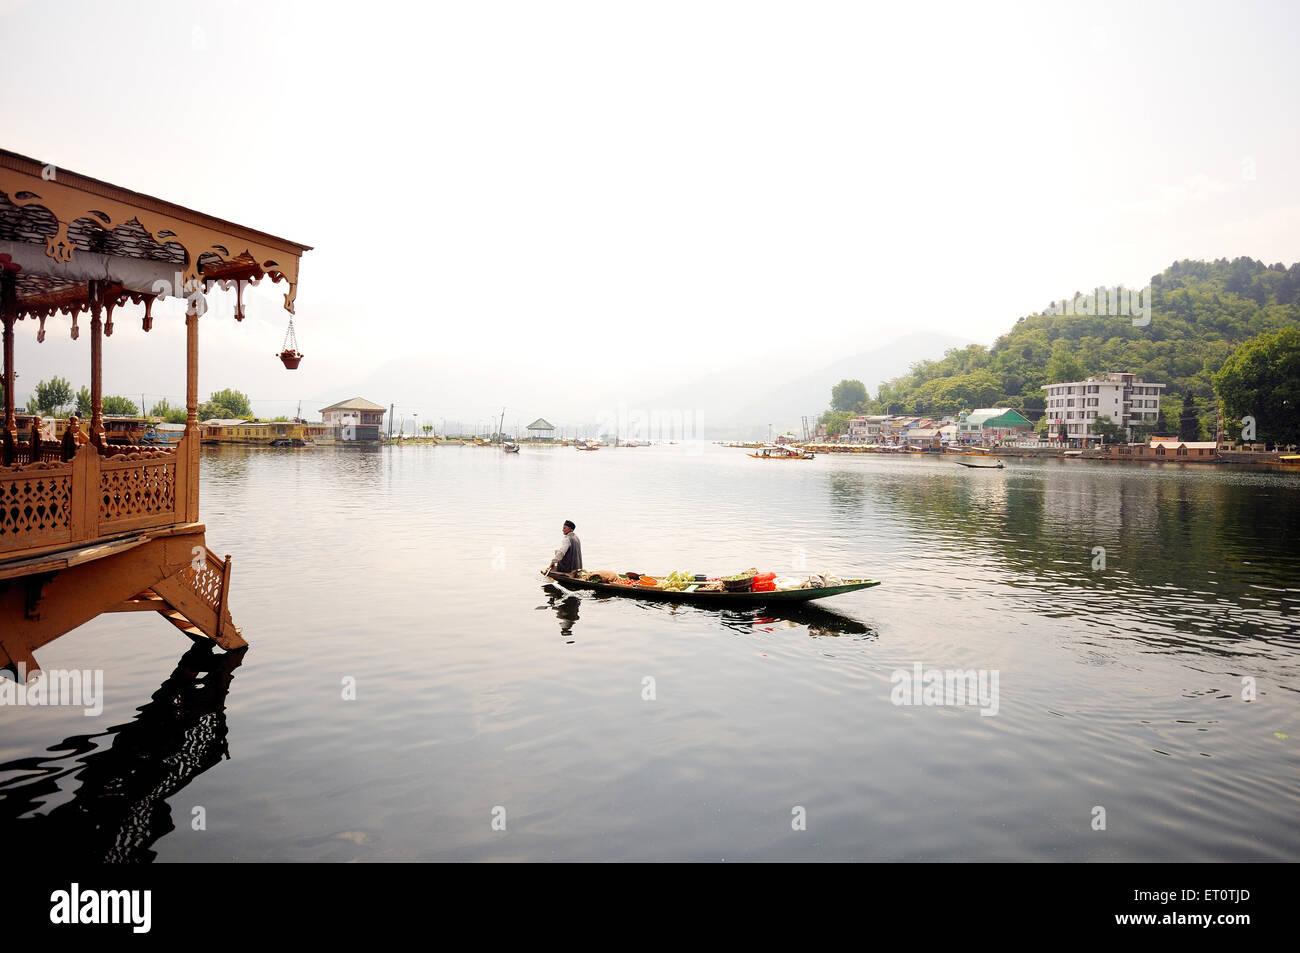 Houseboat and canoe in dal lake ; Srinagar ; Jammu and Kashmir ; India - Stock Image